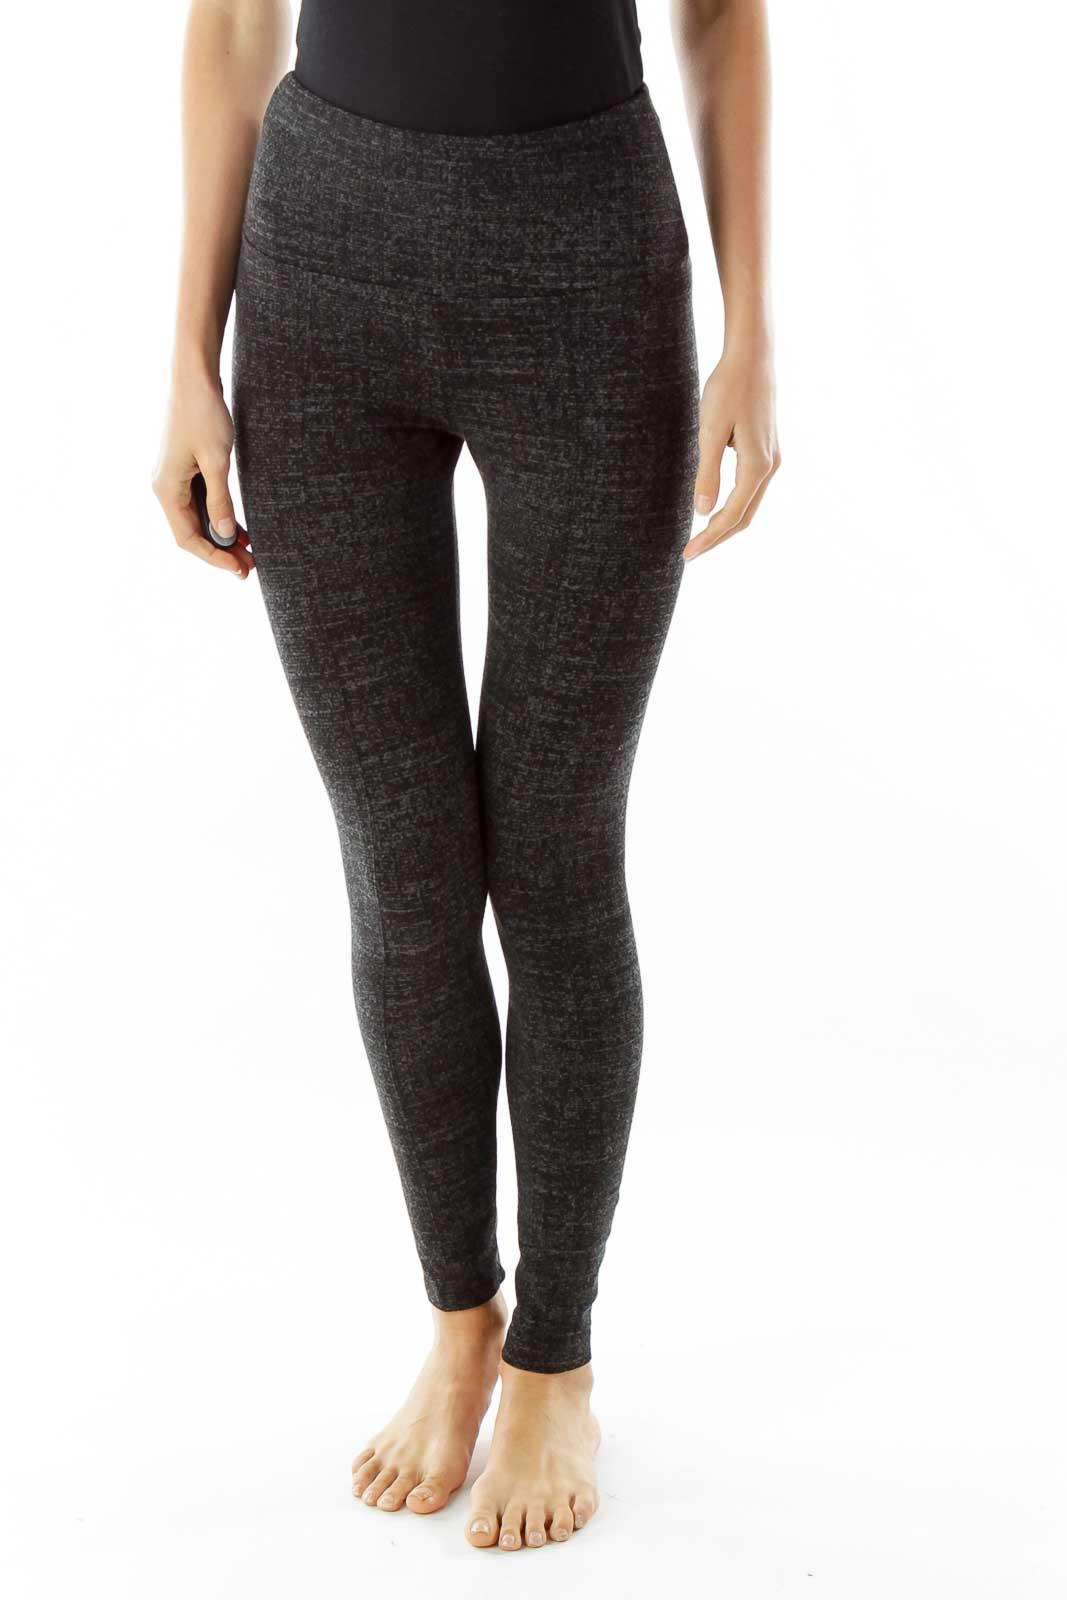 Gray Yoga Pants Front